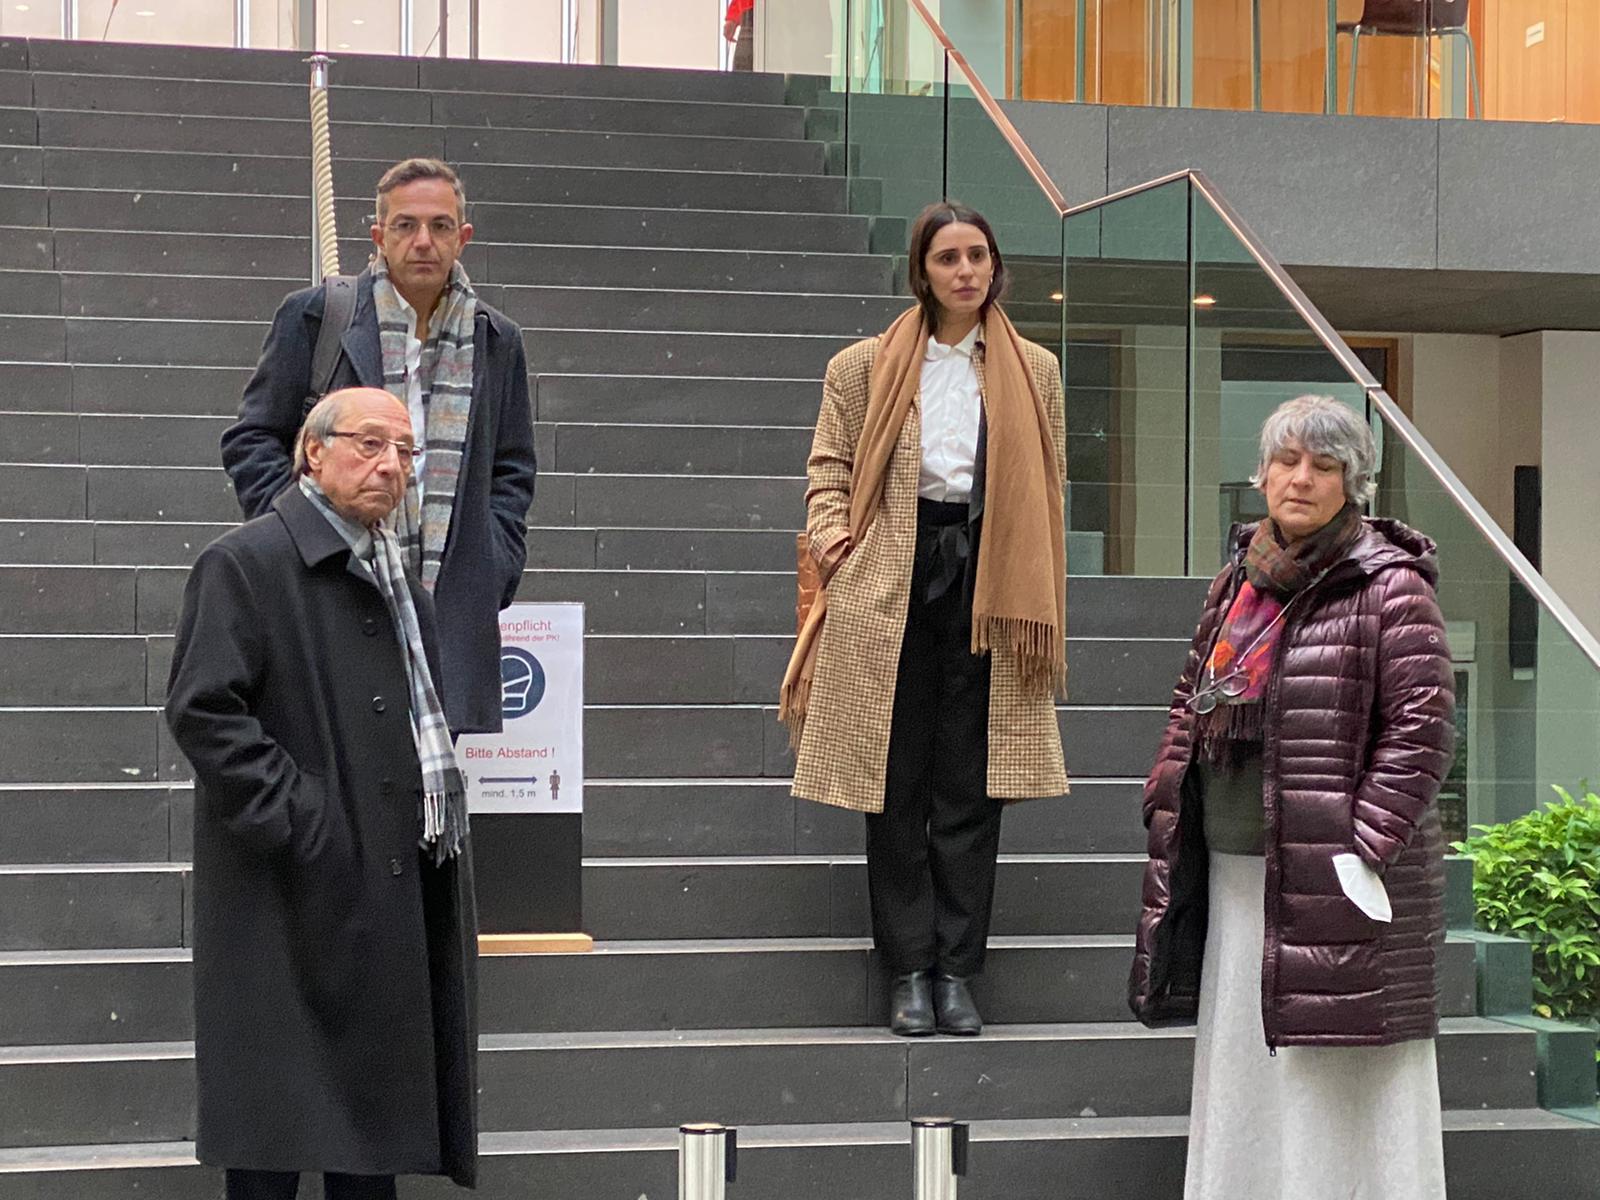 Von links: Bahman Niroumand, Navid Kermani, Maryam Zaree und Parastou Forouhar